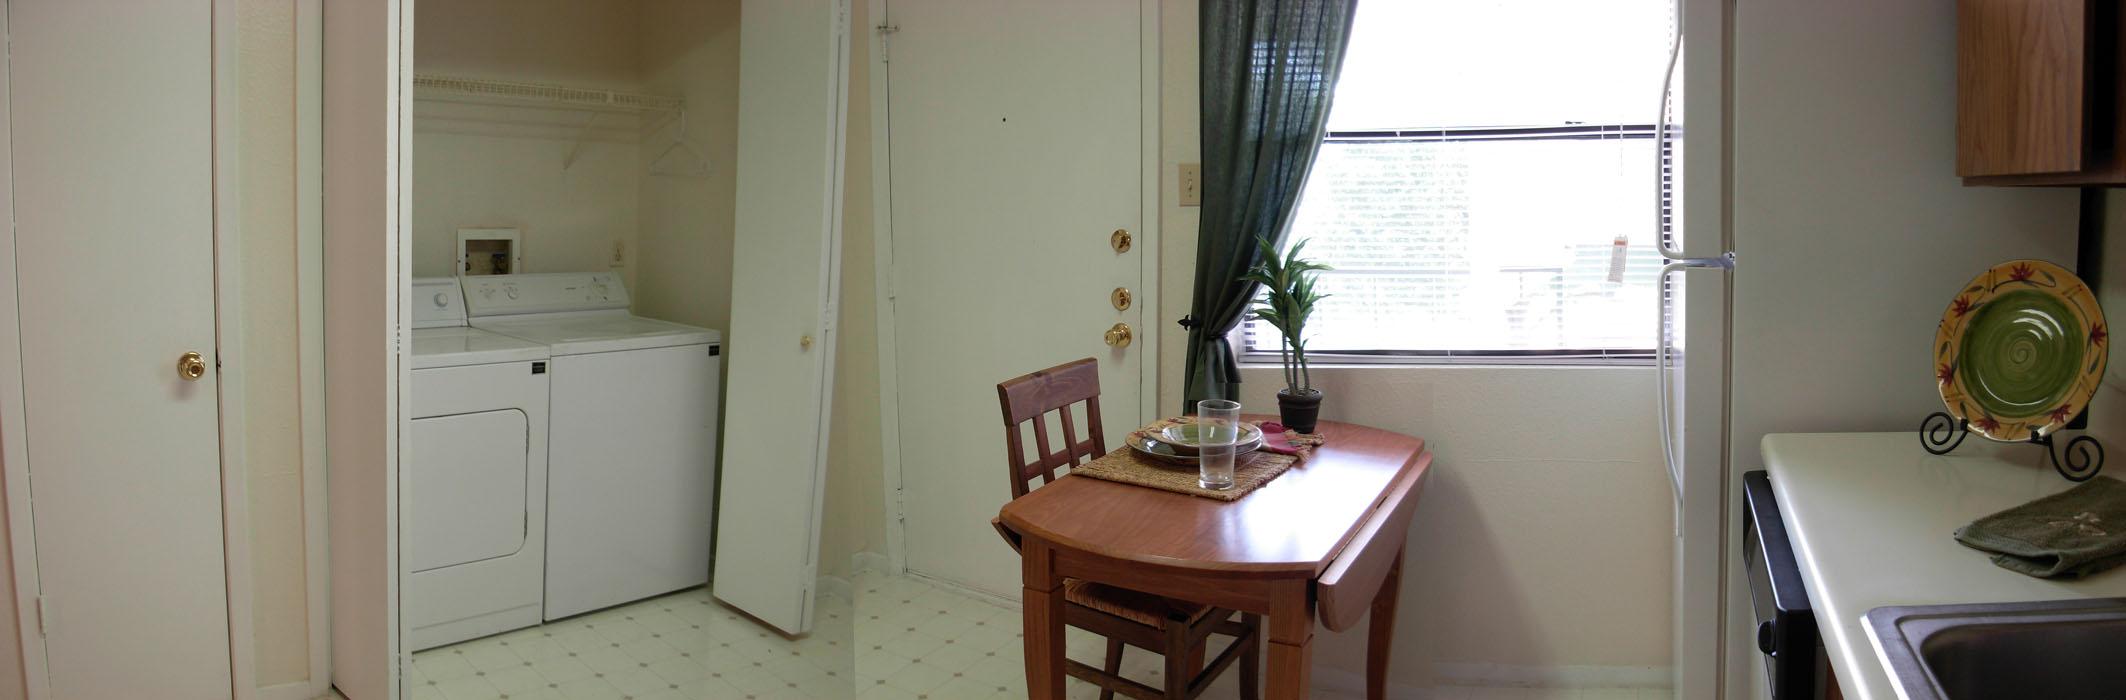 Apartments Near Blinn College Brenham